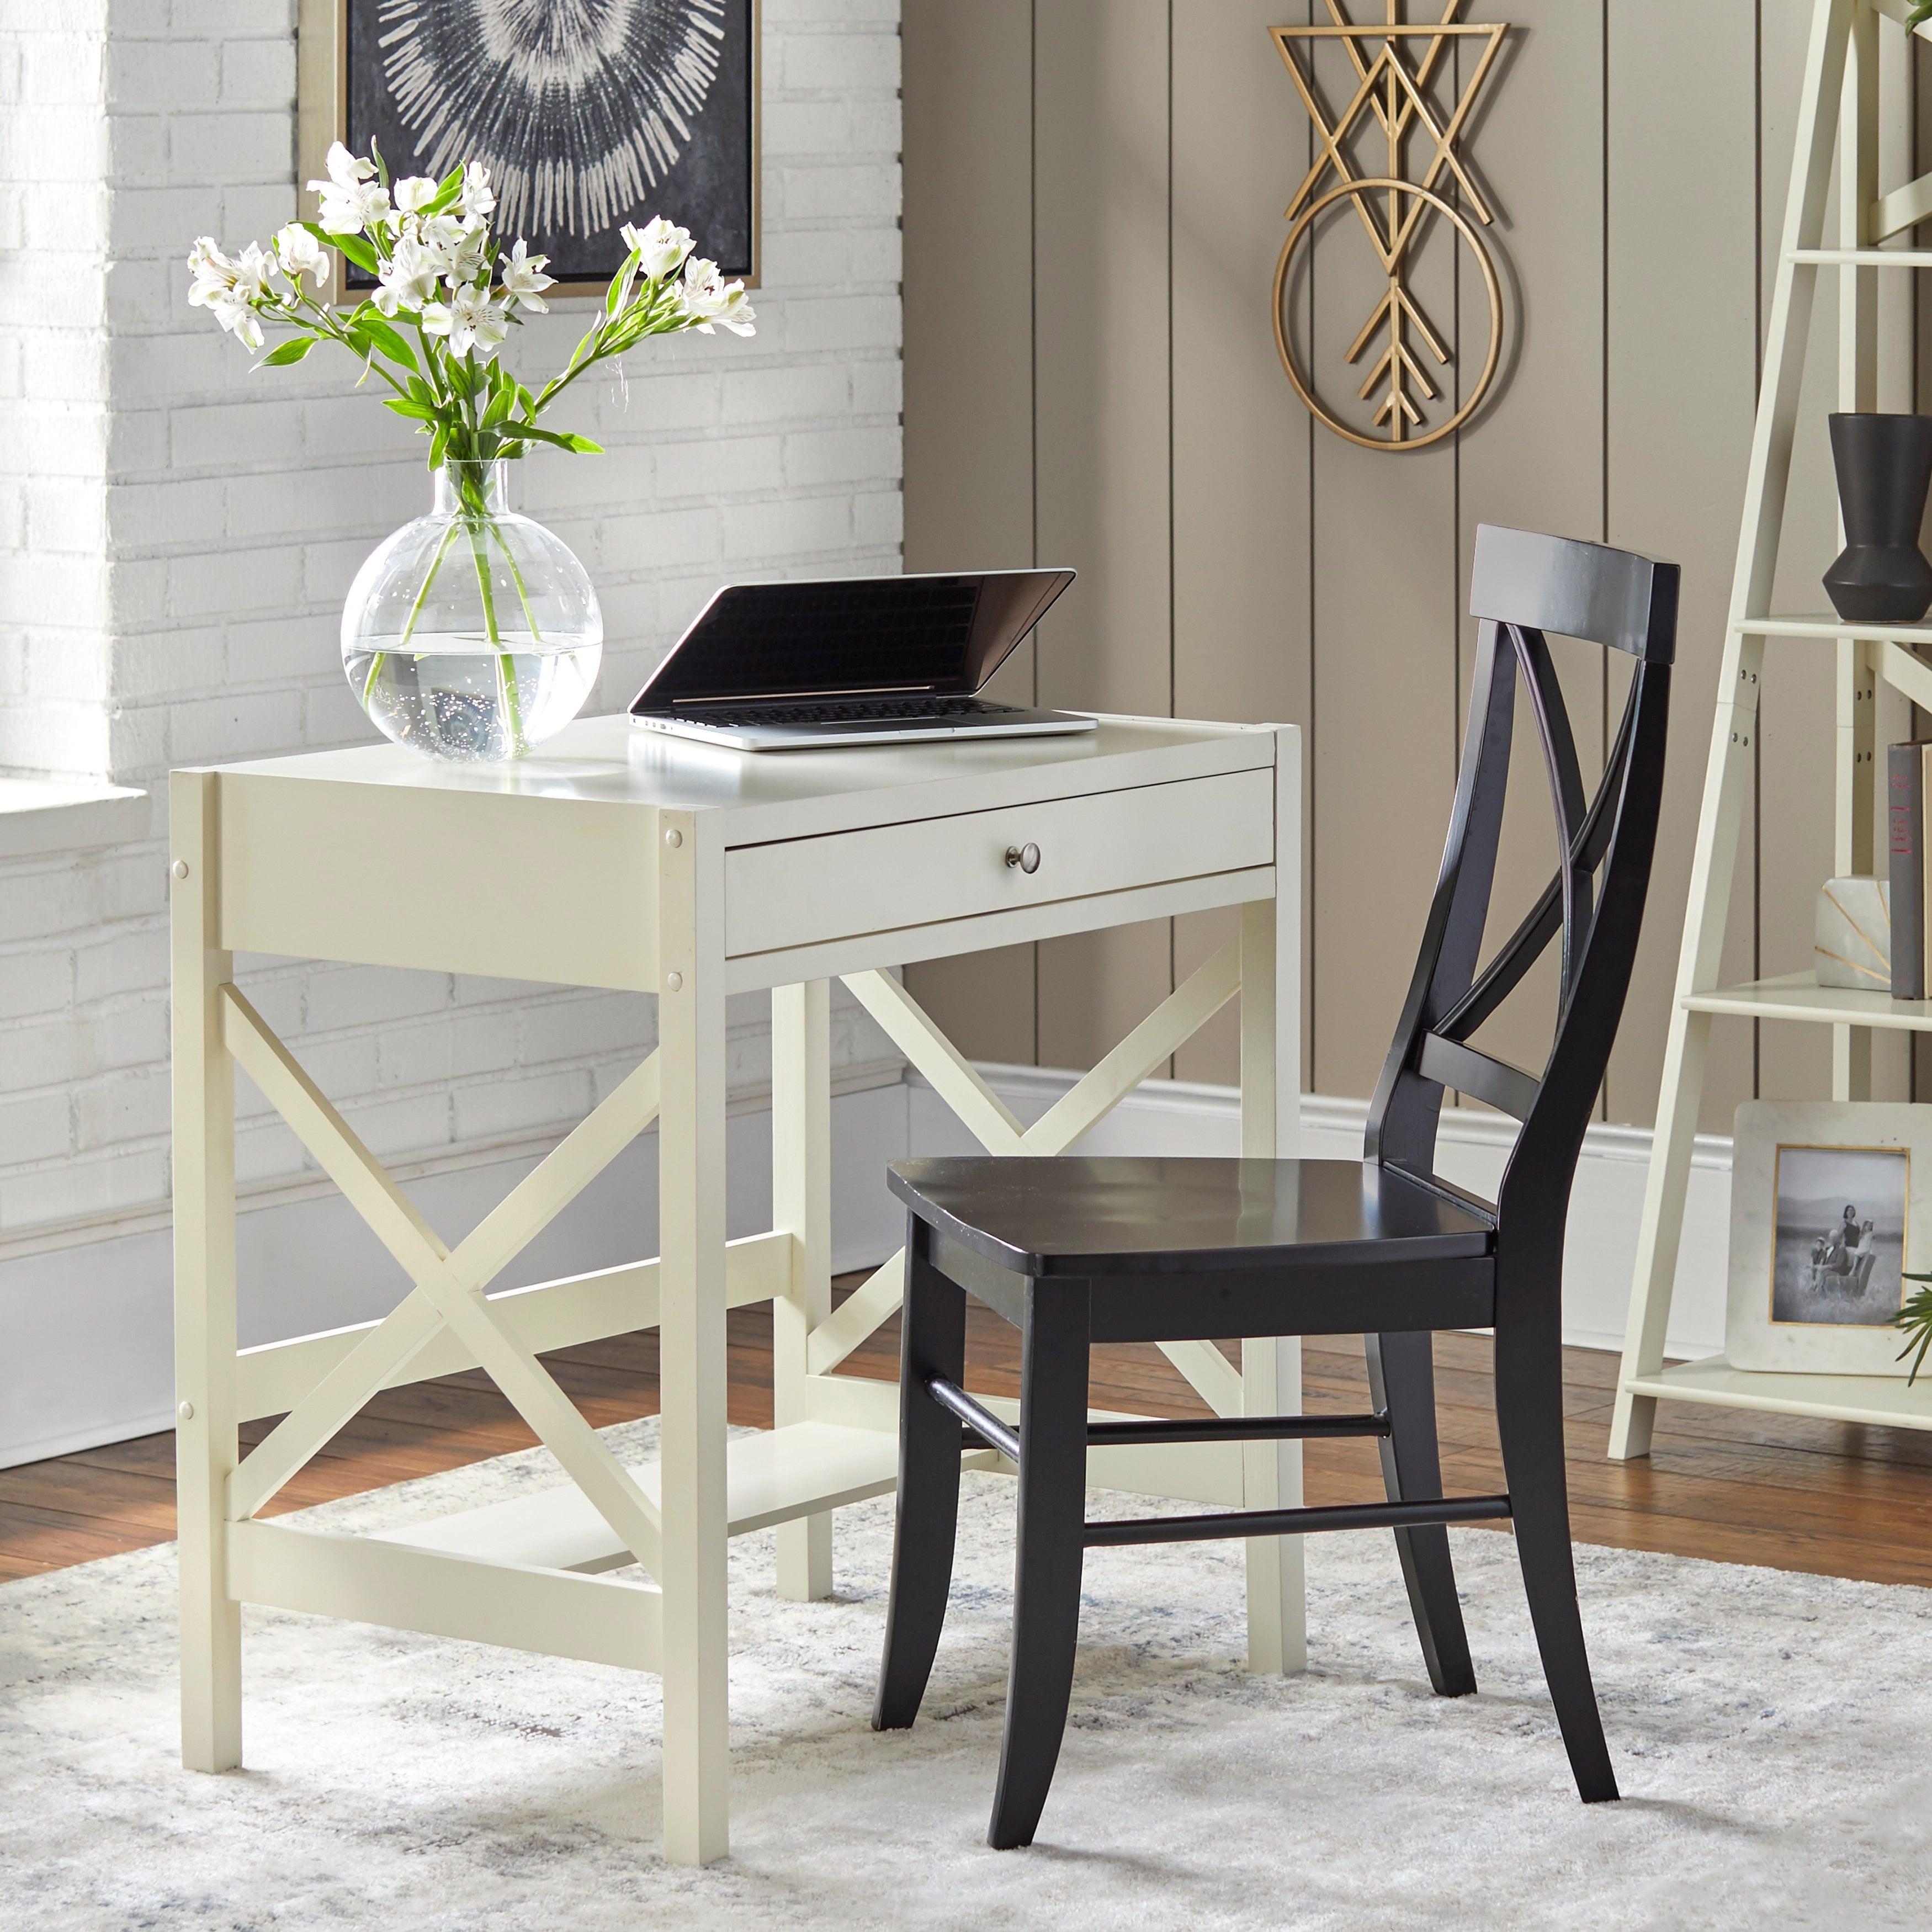 Buy Bedroom Desks & Computer Tables Online at Overstock.com | Our ...